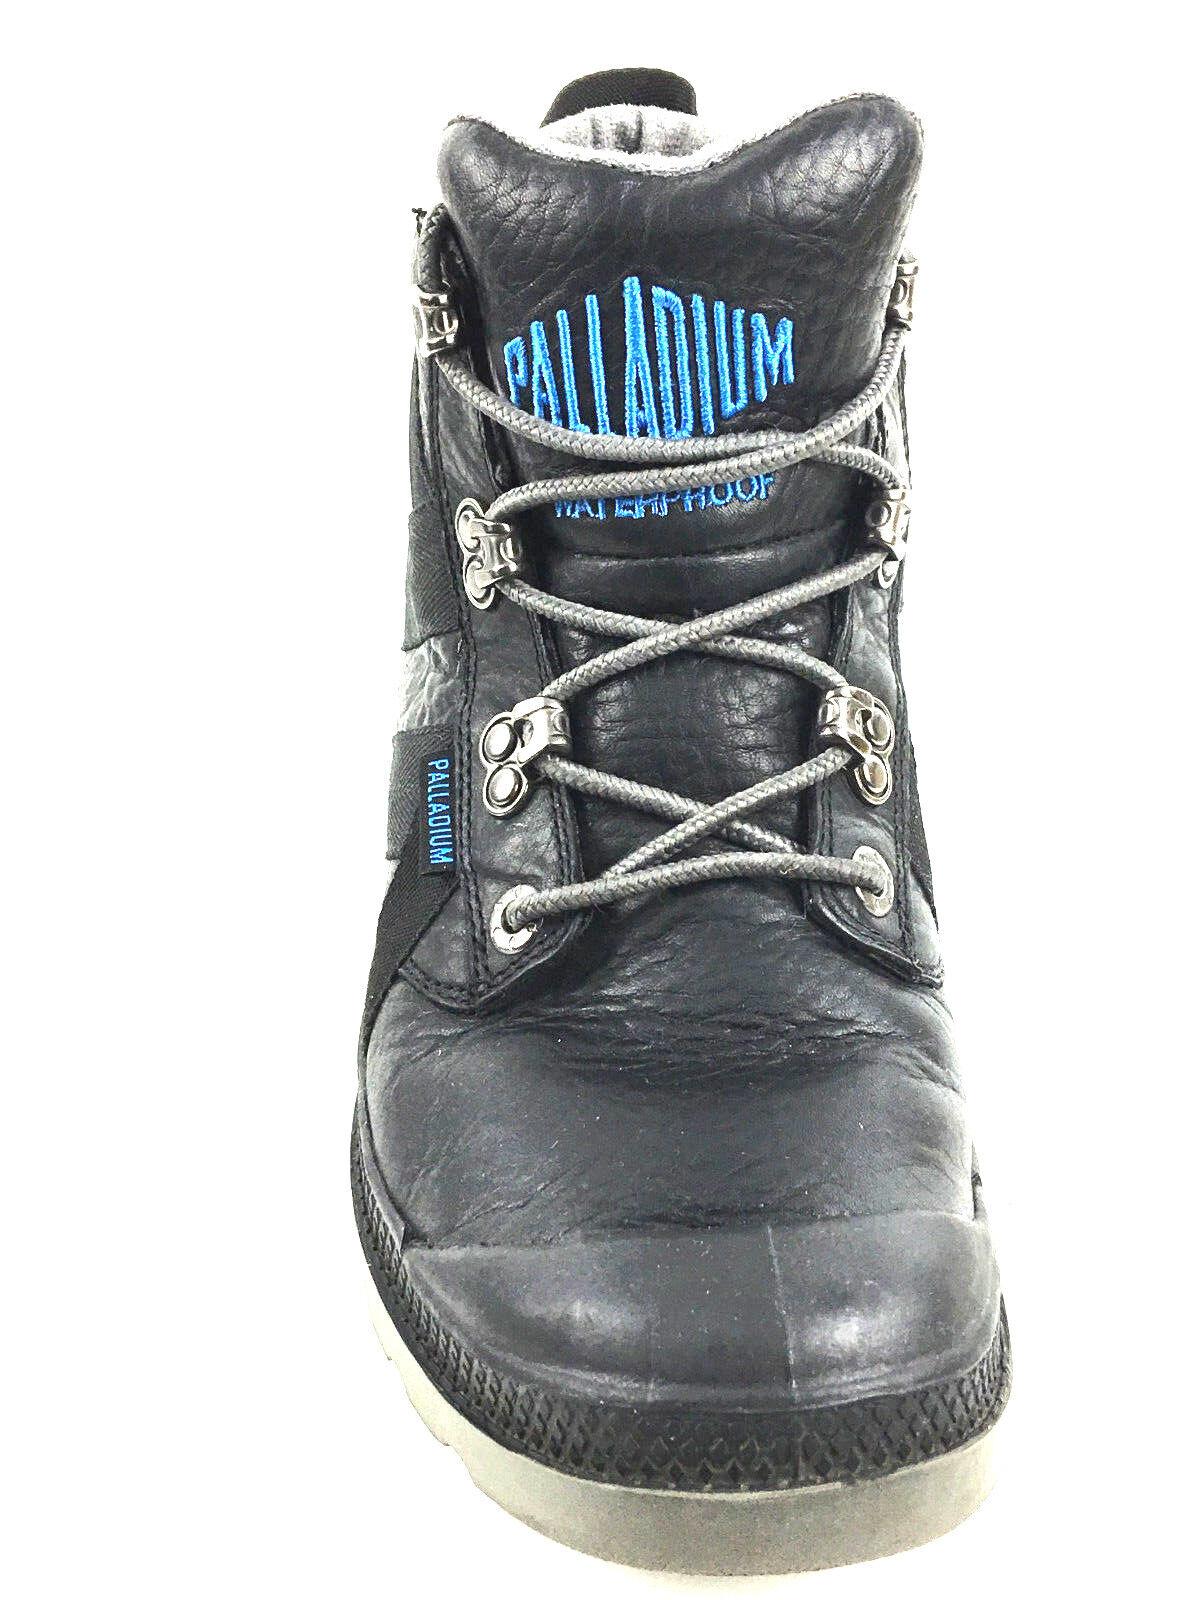 comodamente Palladium nero Leather Ankle stivali Dimensione US 10 UK9 UK9 UK9 EU. 43  Ultimo 2018